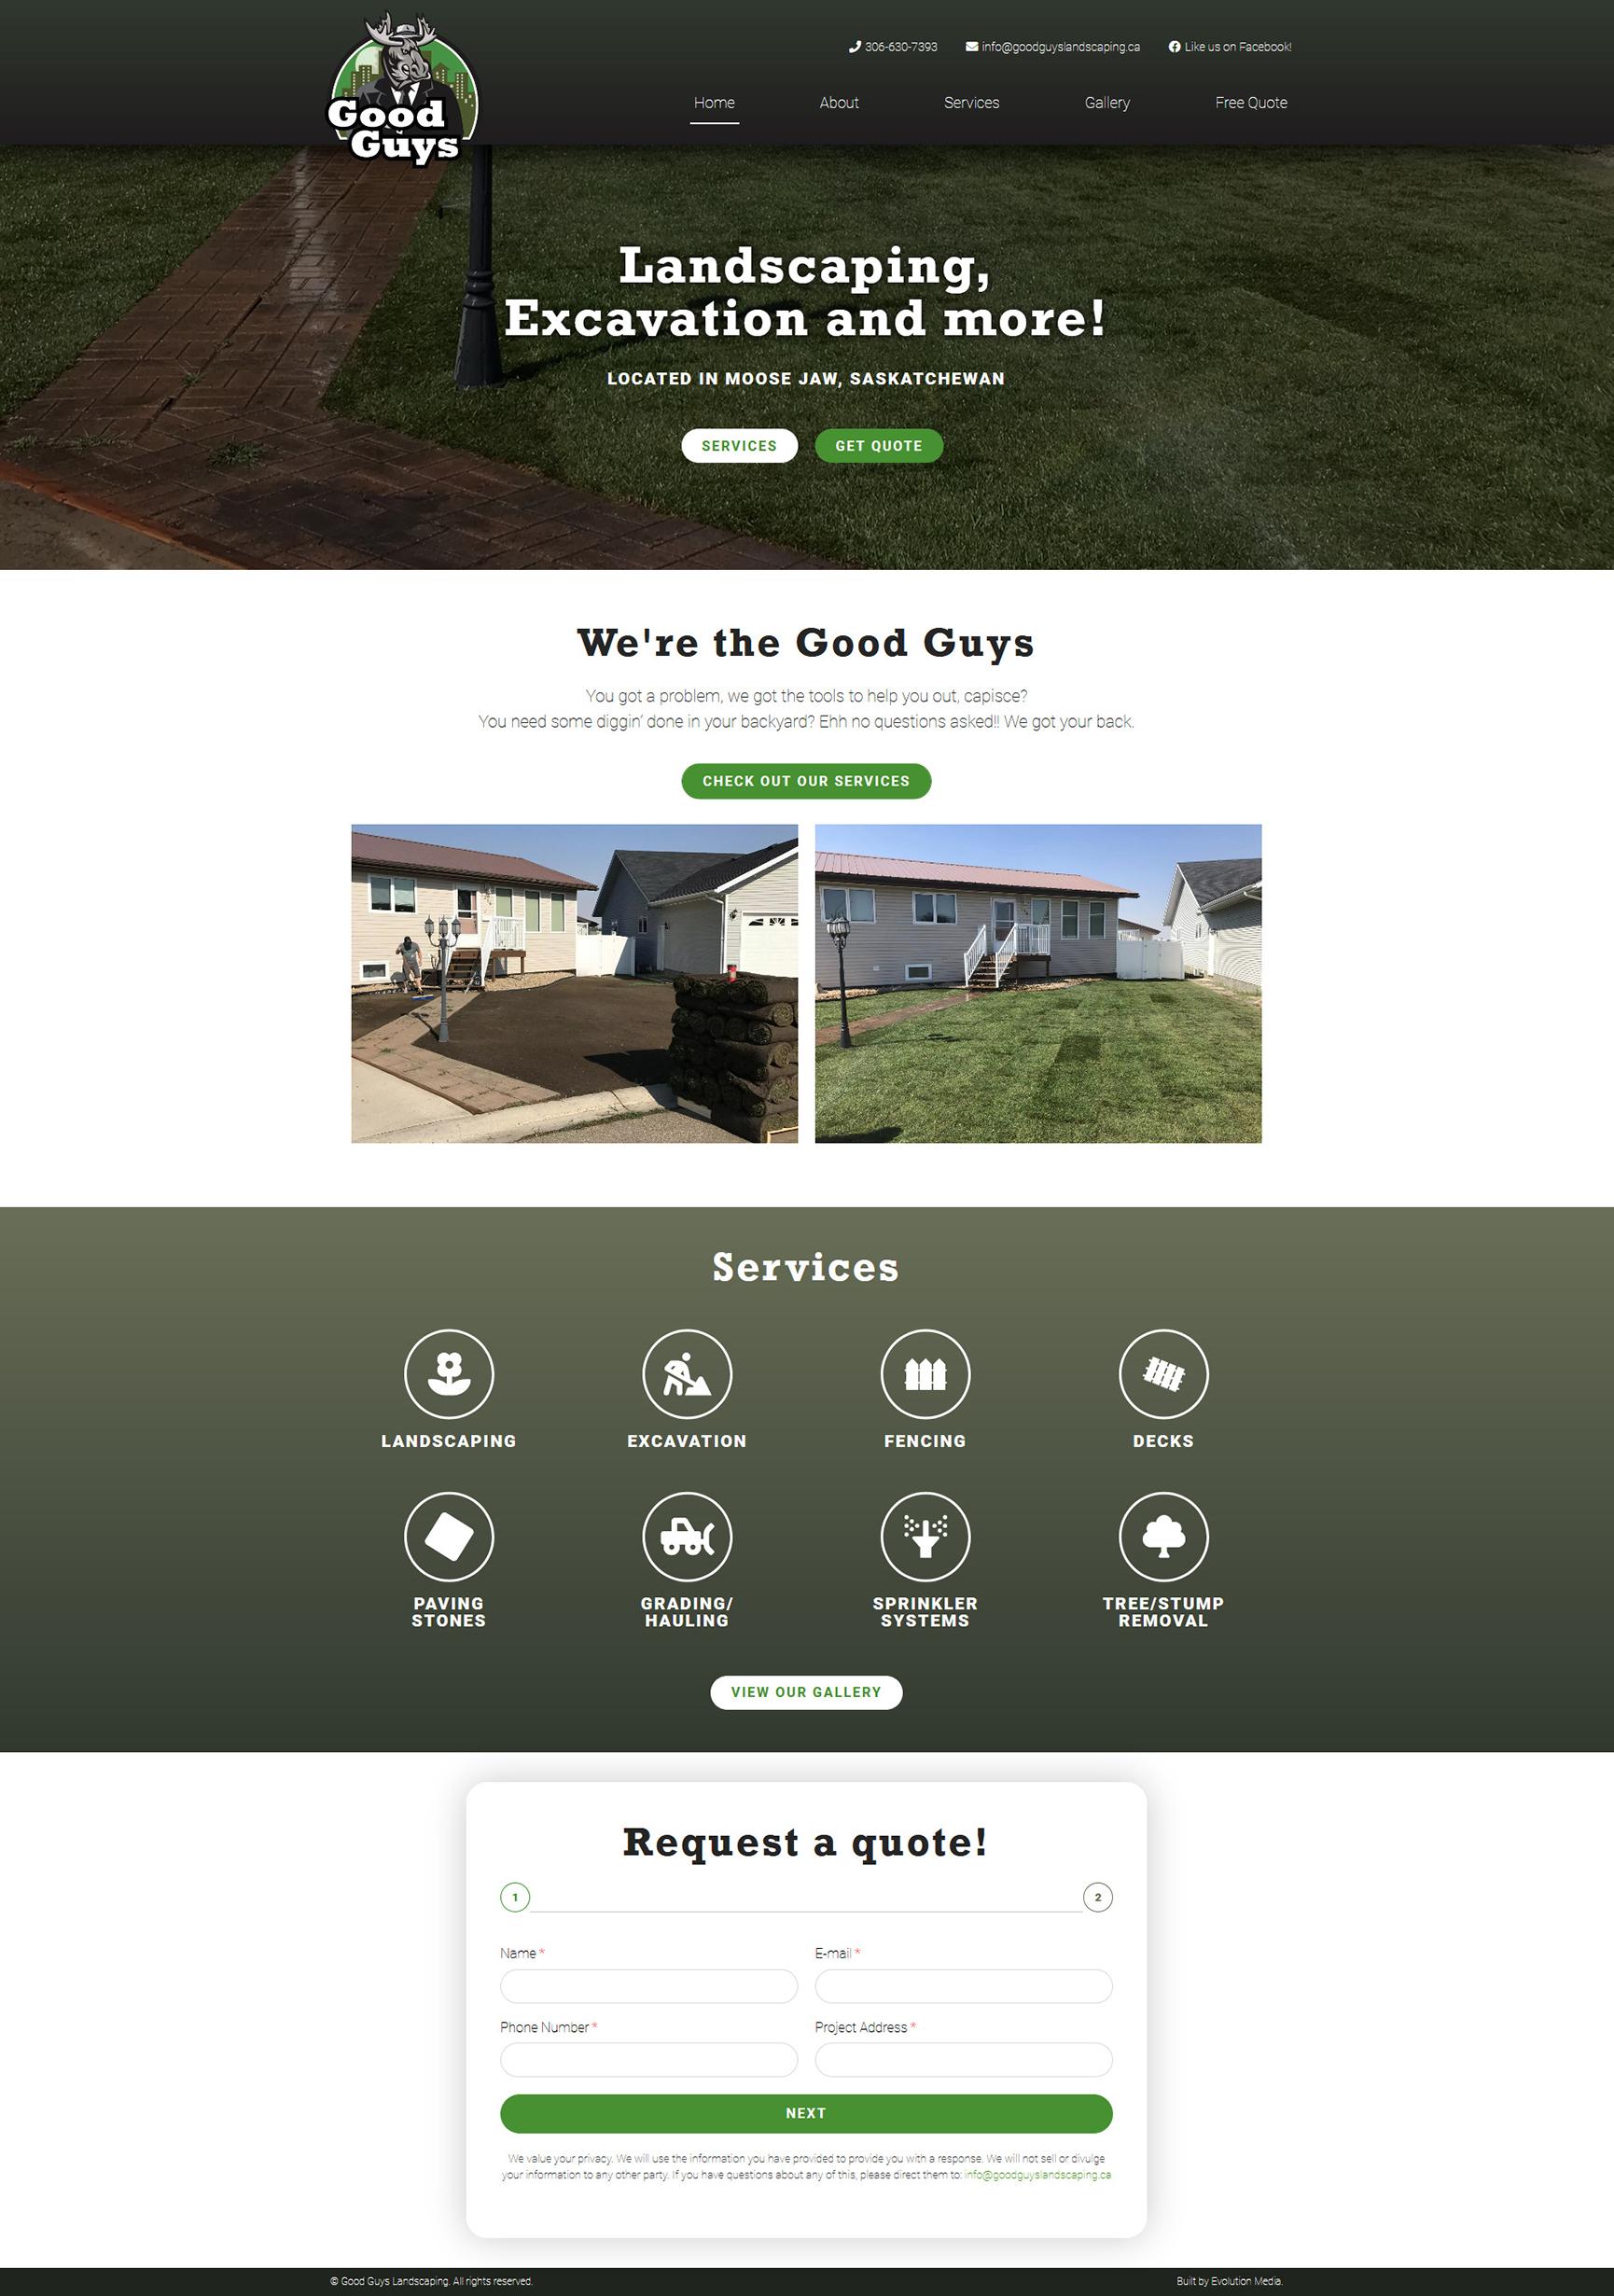 good-guys-landscaping